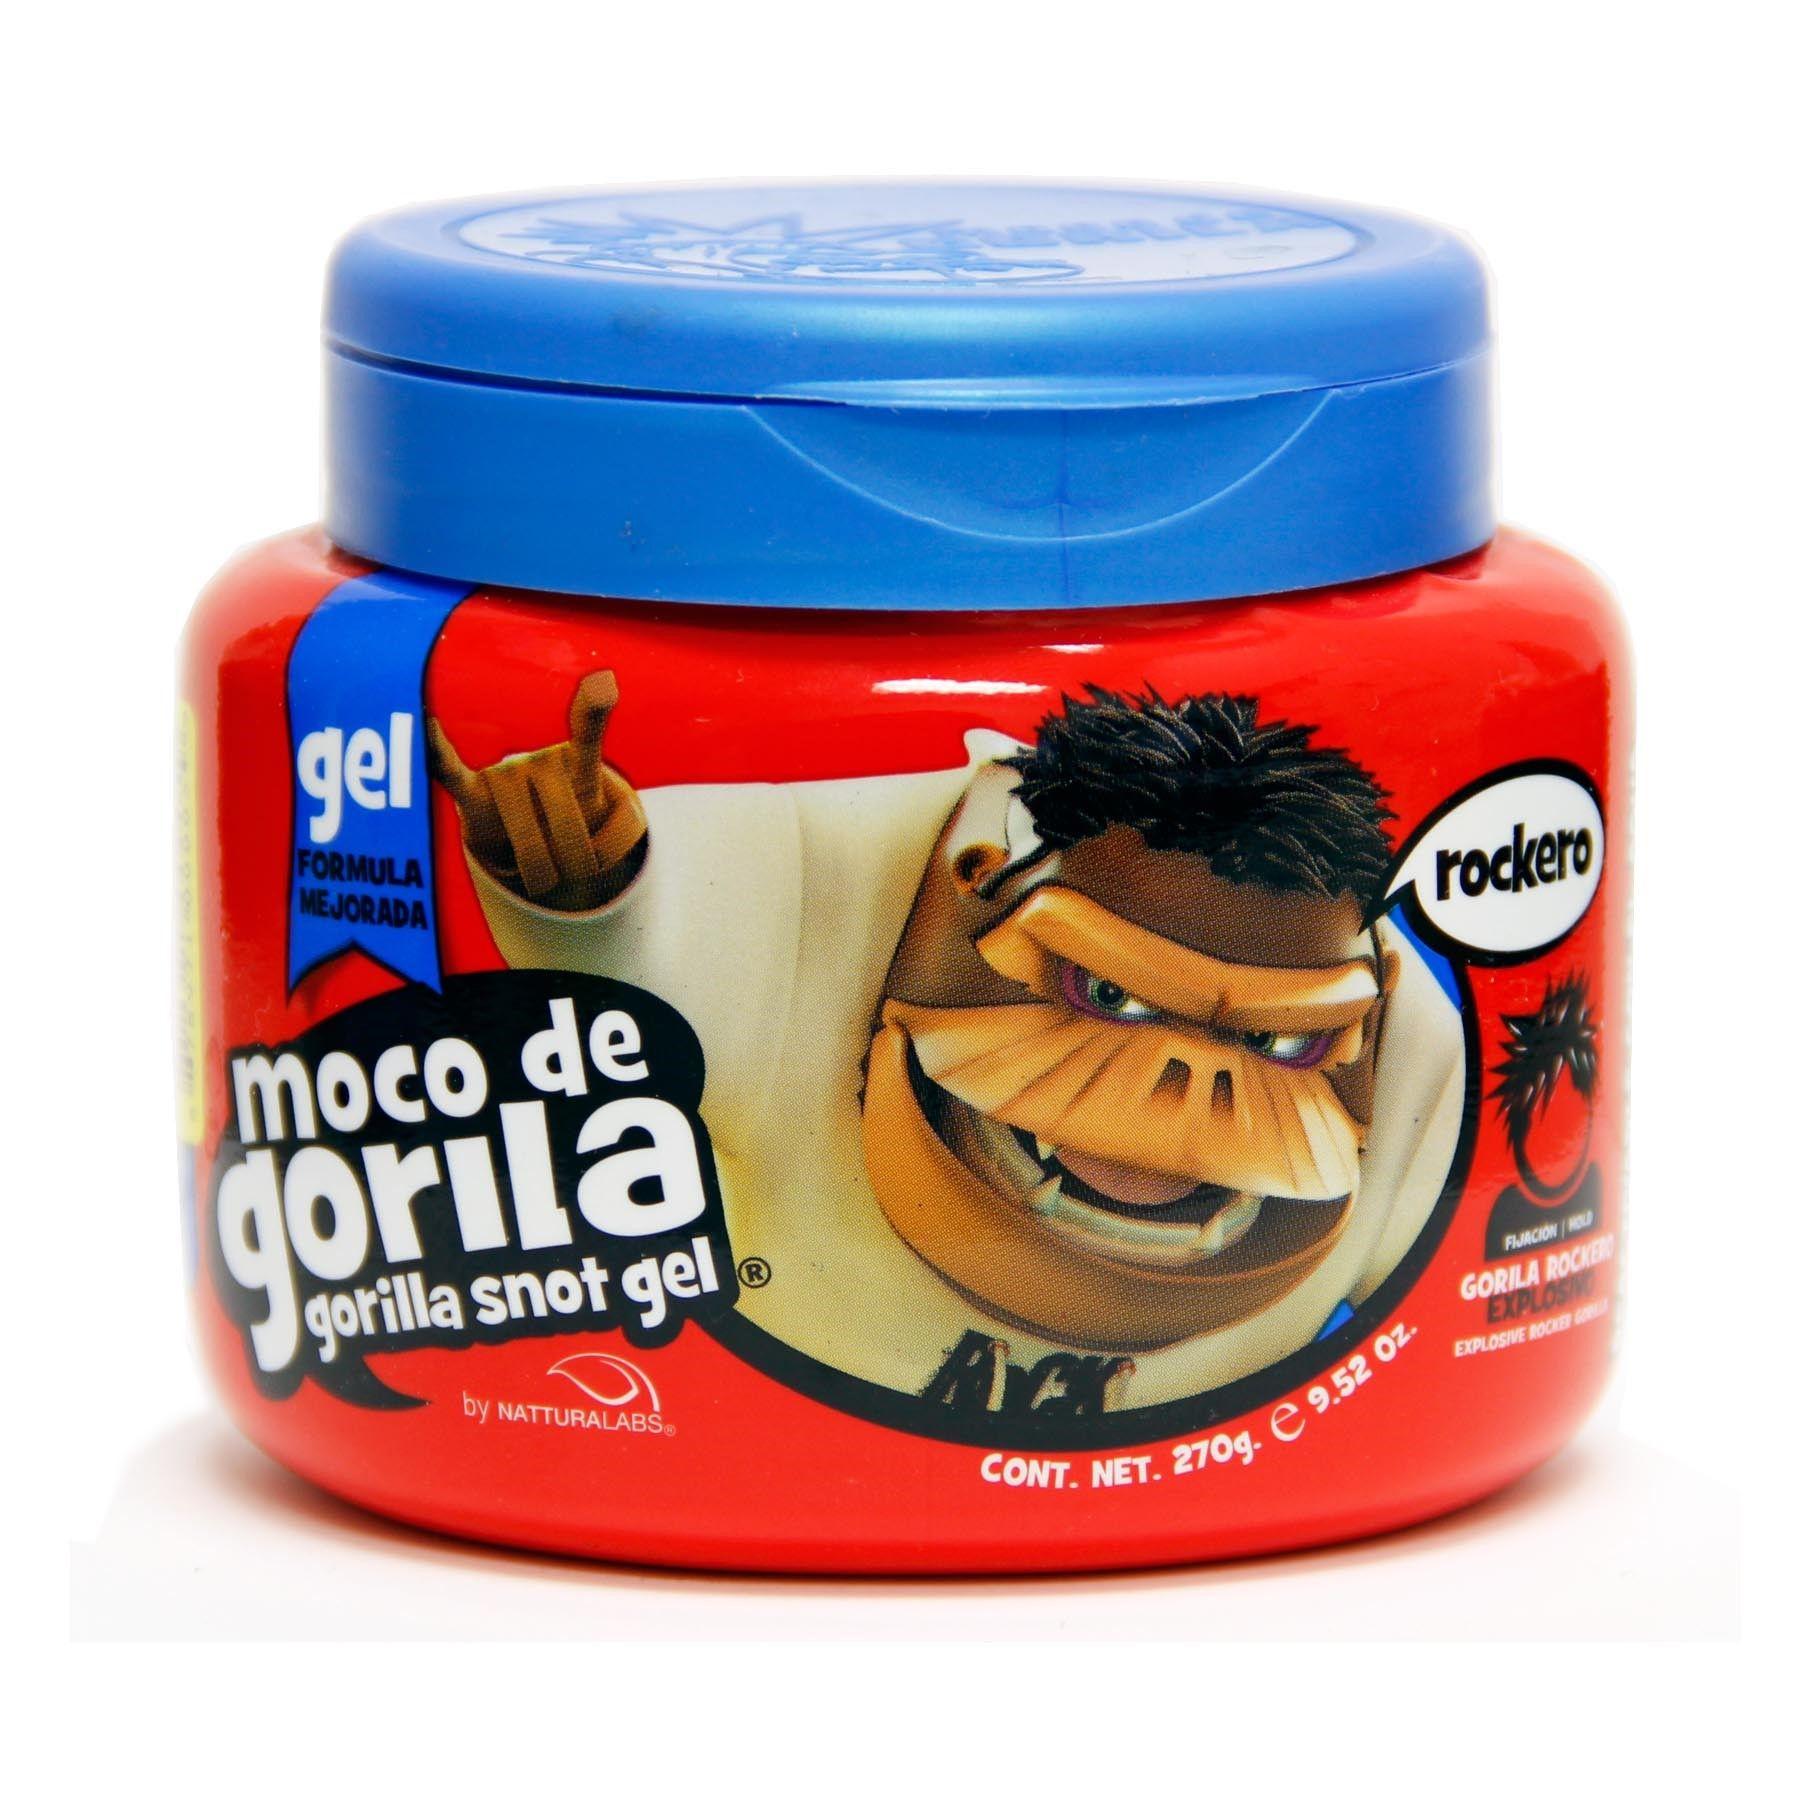 Moco De Gorila Rockero Snot Gel - Red - 270g